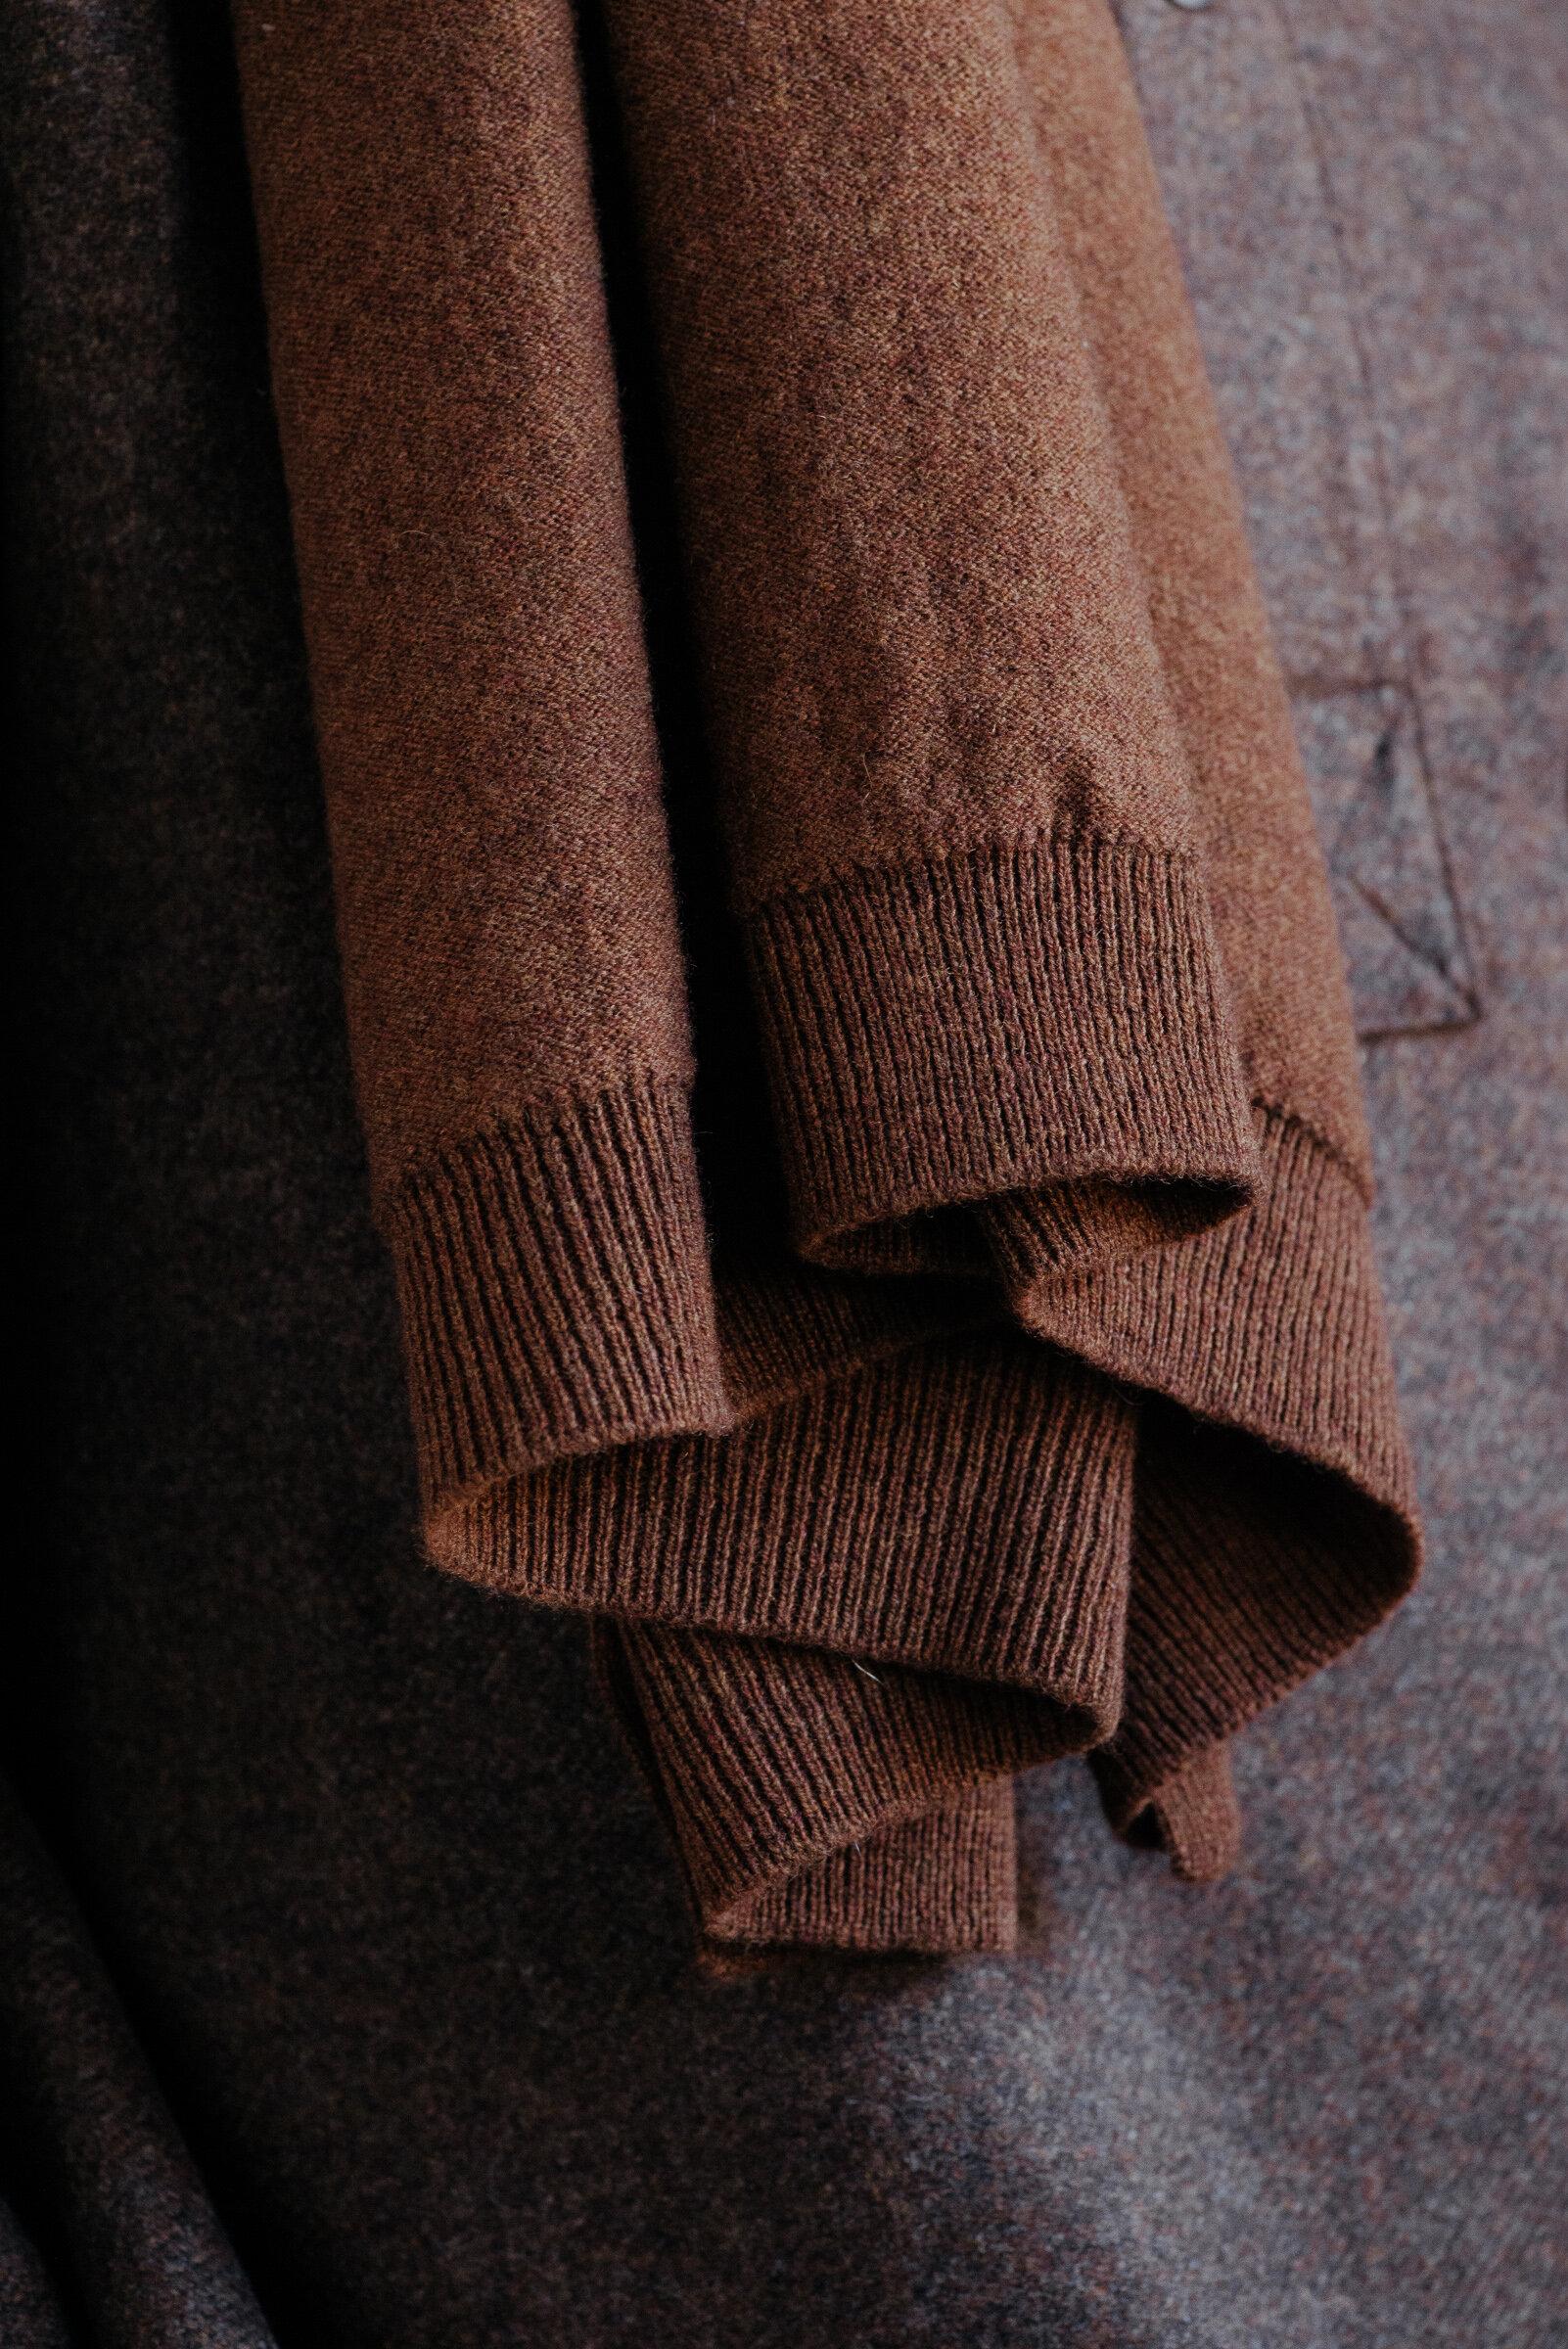 evan-kinori-knit-shawl-cashmere-lambswool-made-in-italy-4